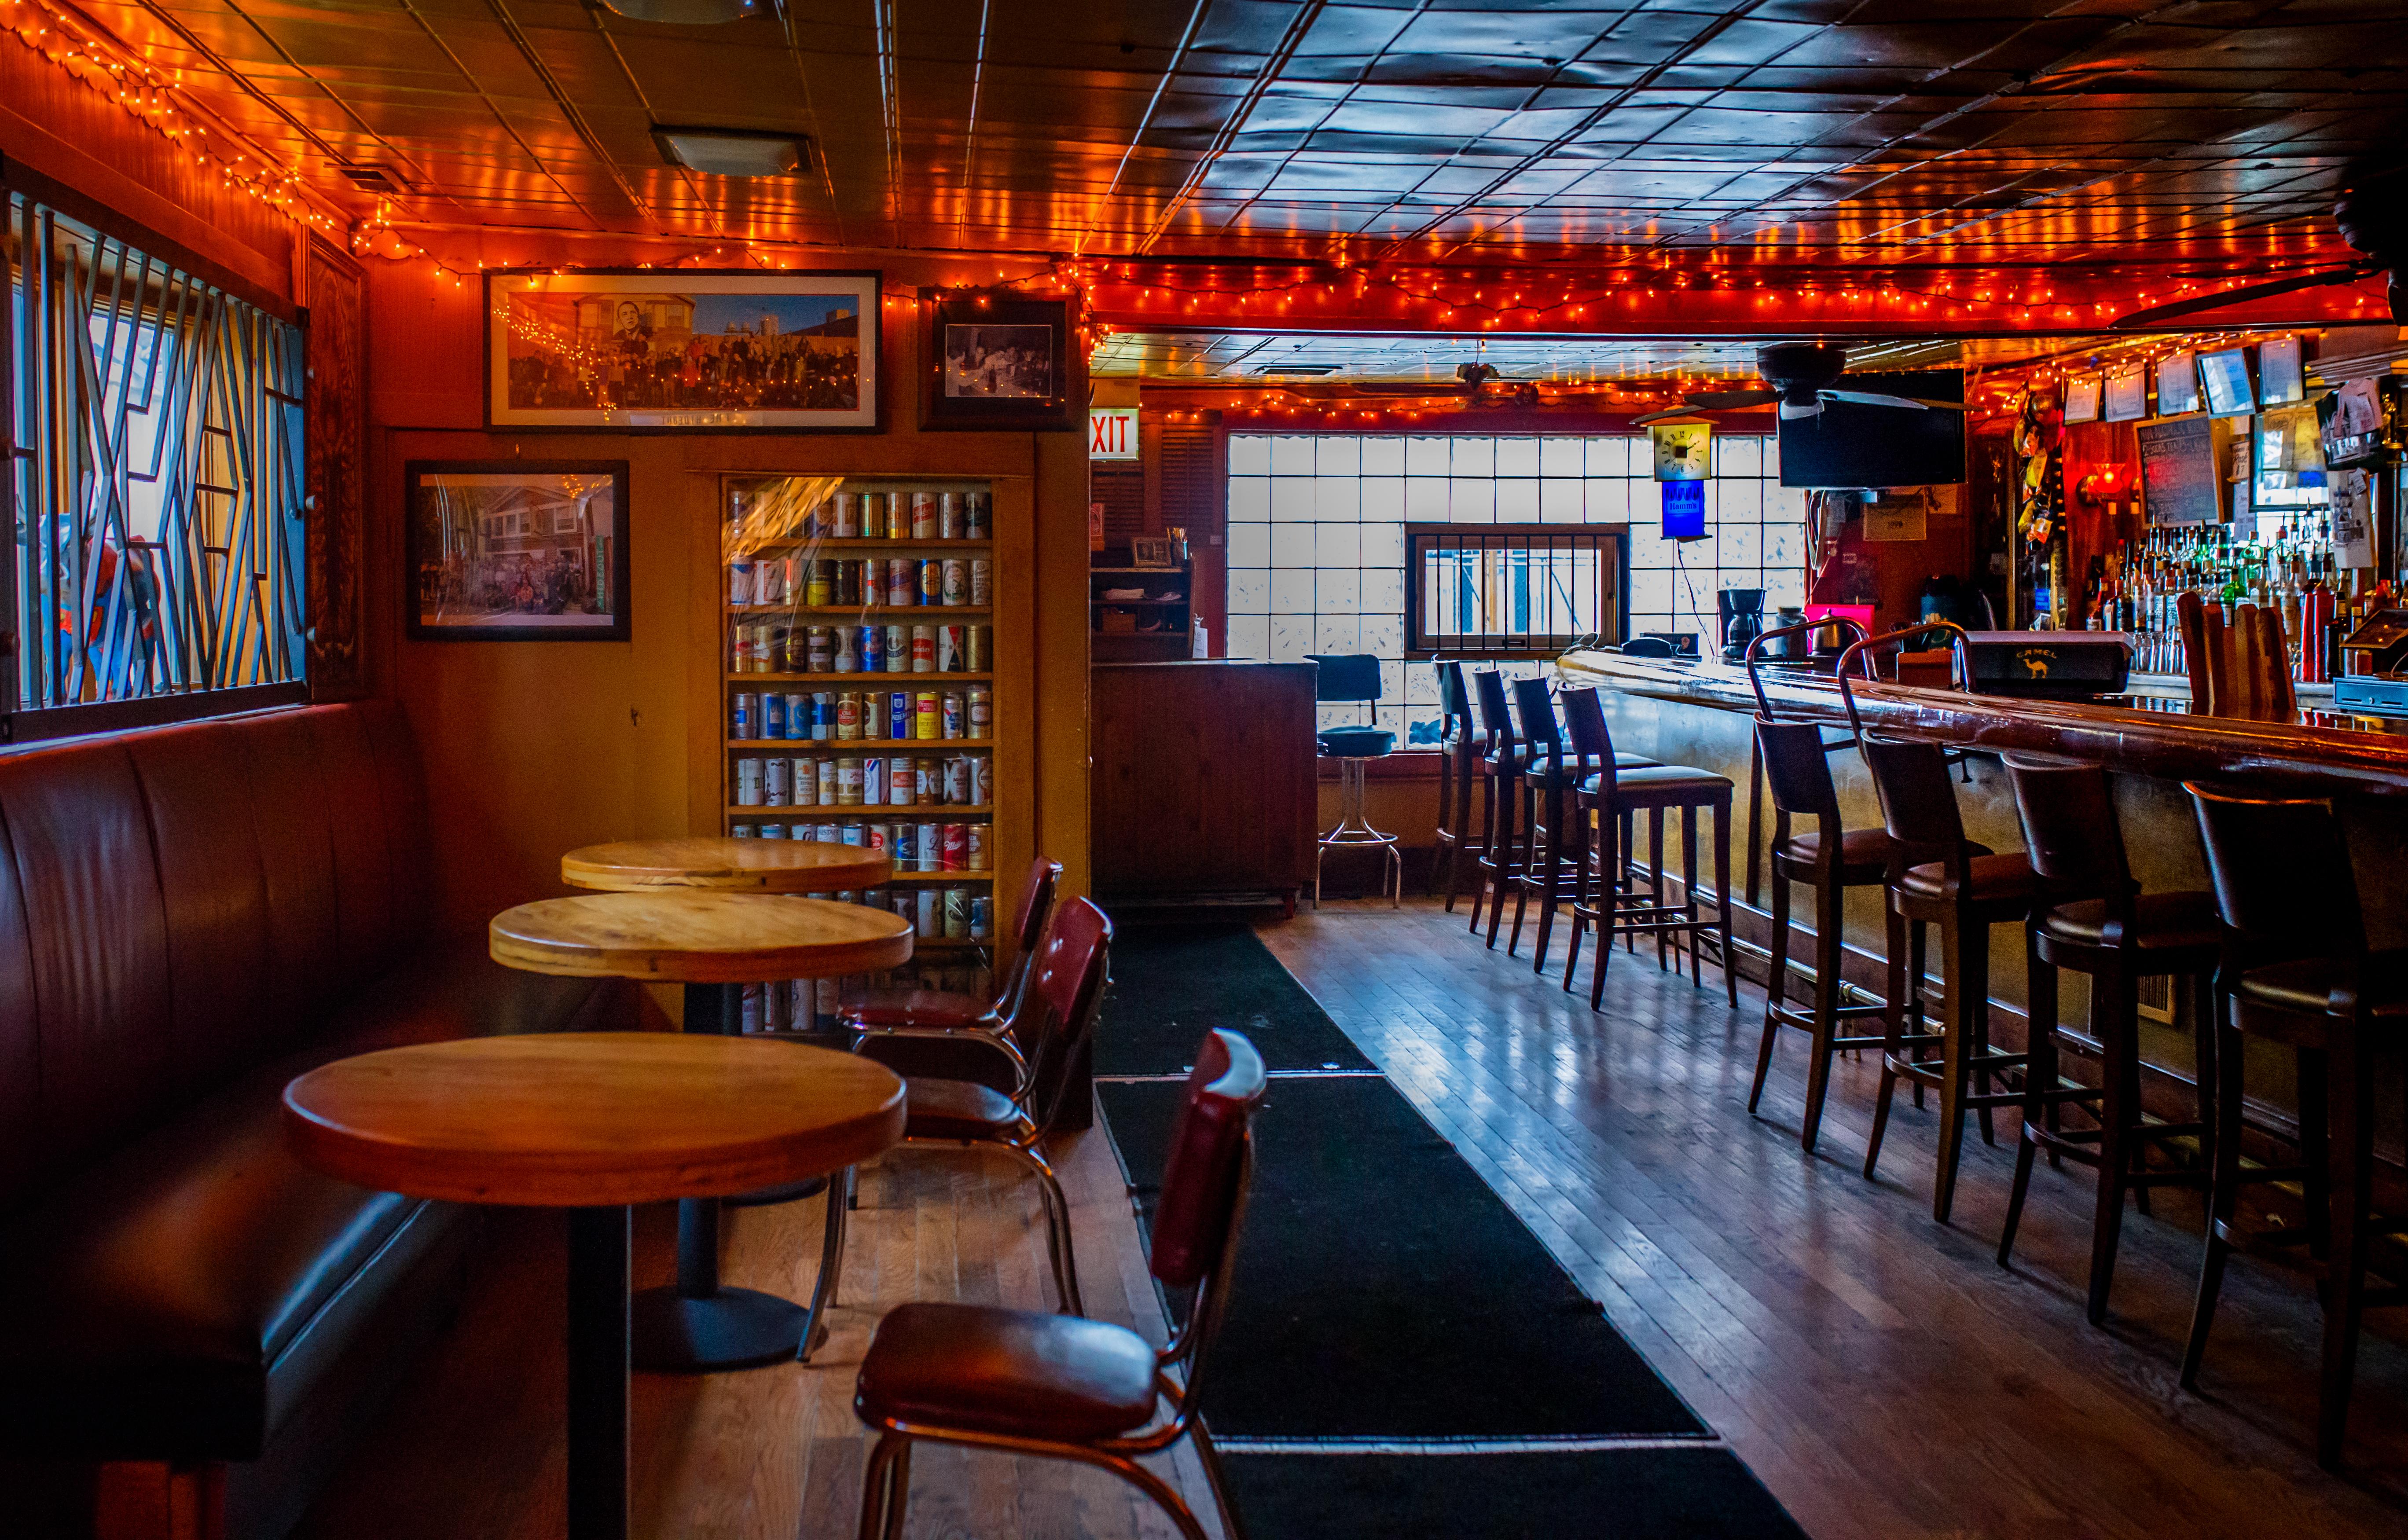 An empty bar space.